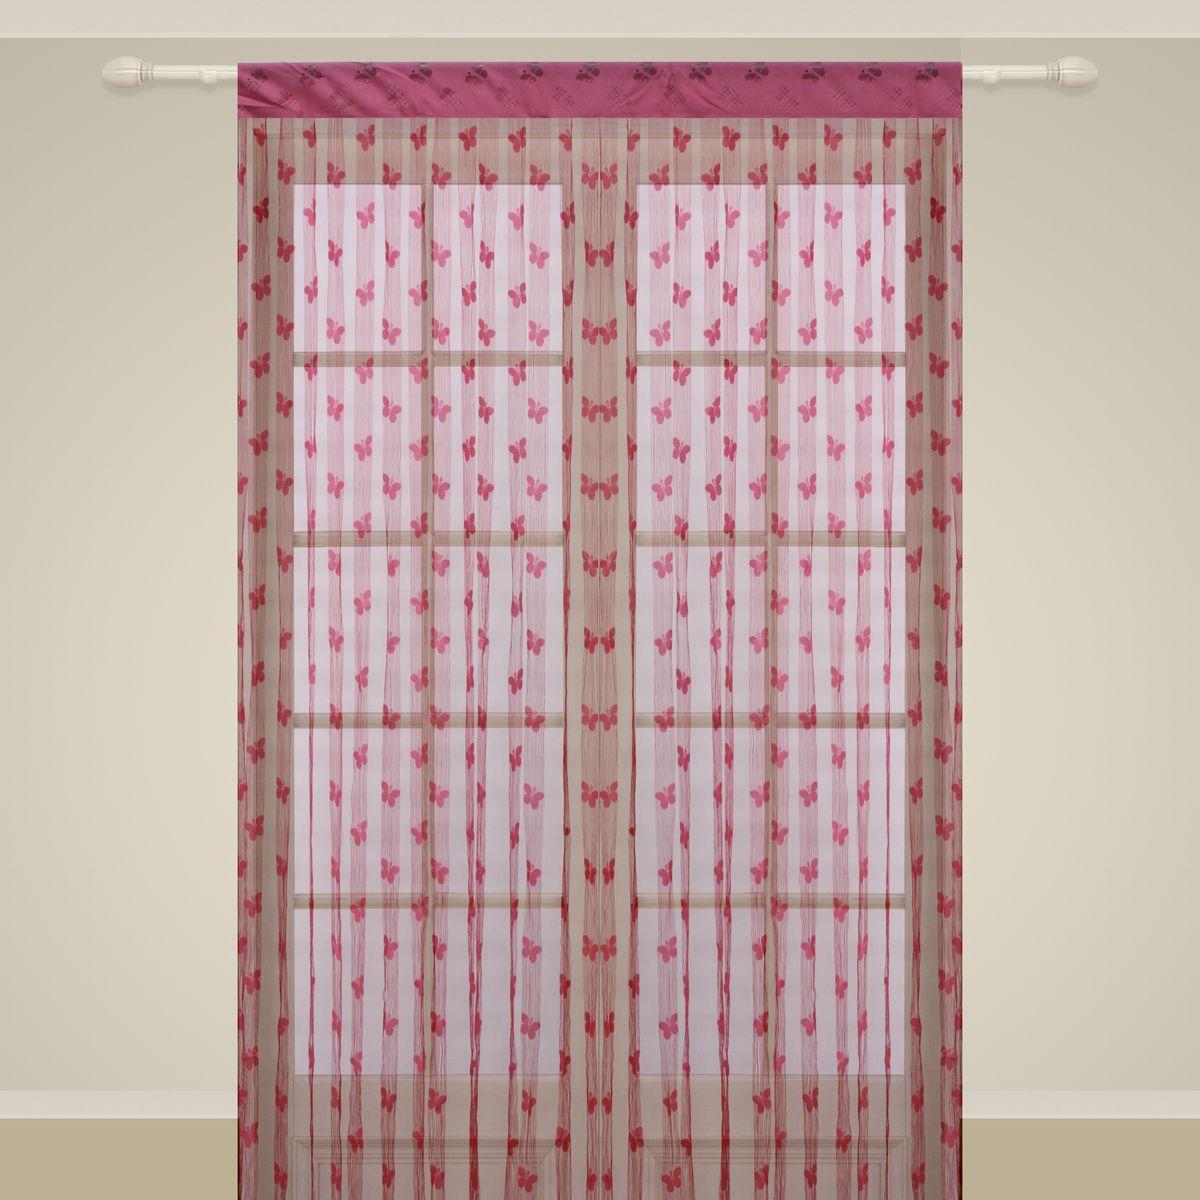 Штора нитяная Sanpa Home Collection, на ленте, цвет: фуксия, высота 290 см. SP106SP 106/FUSHIA, , 150*290 см